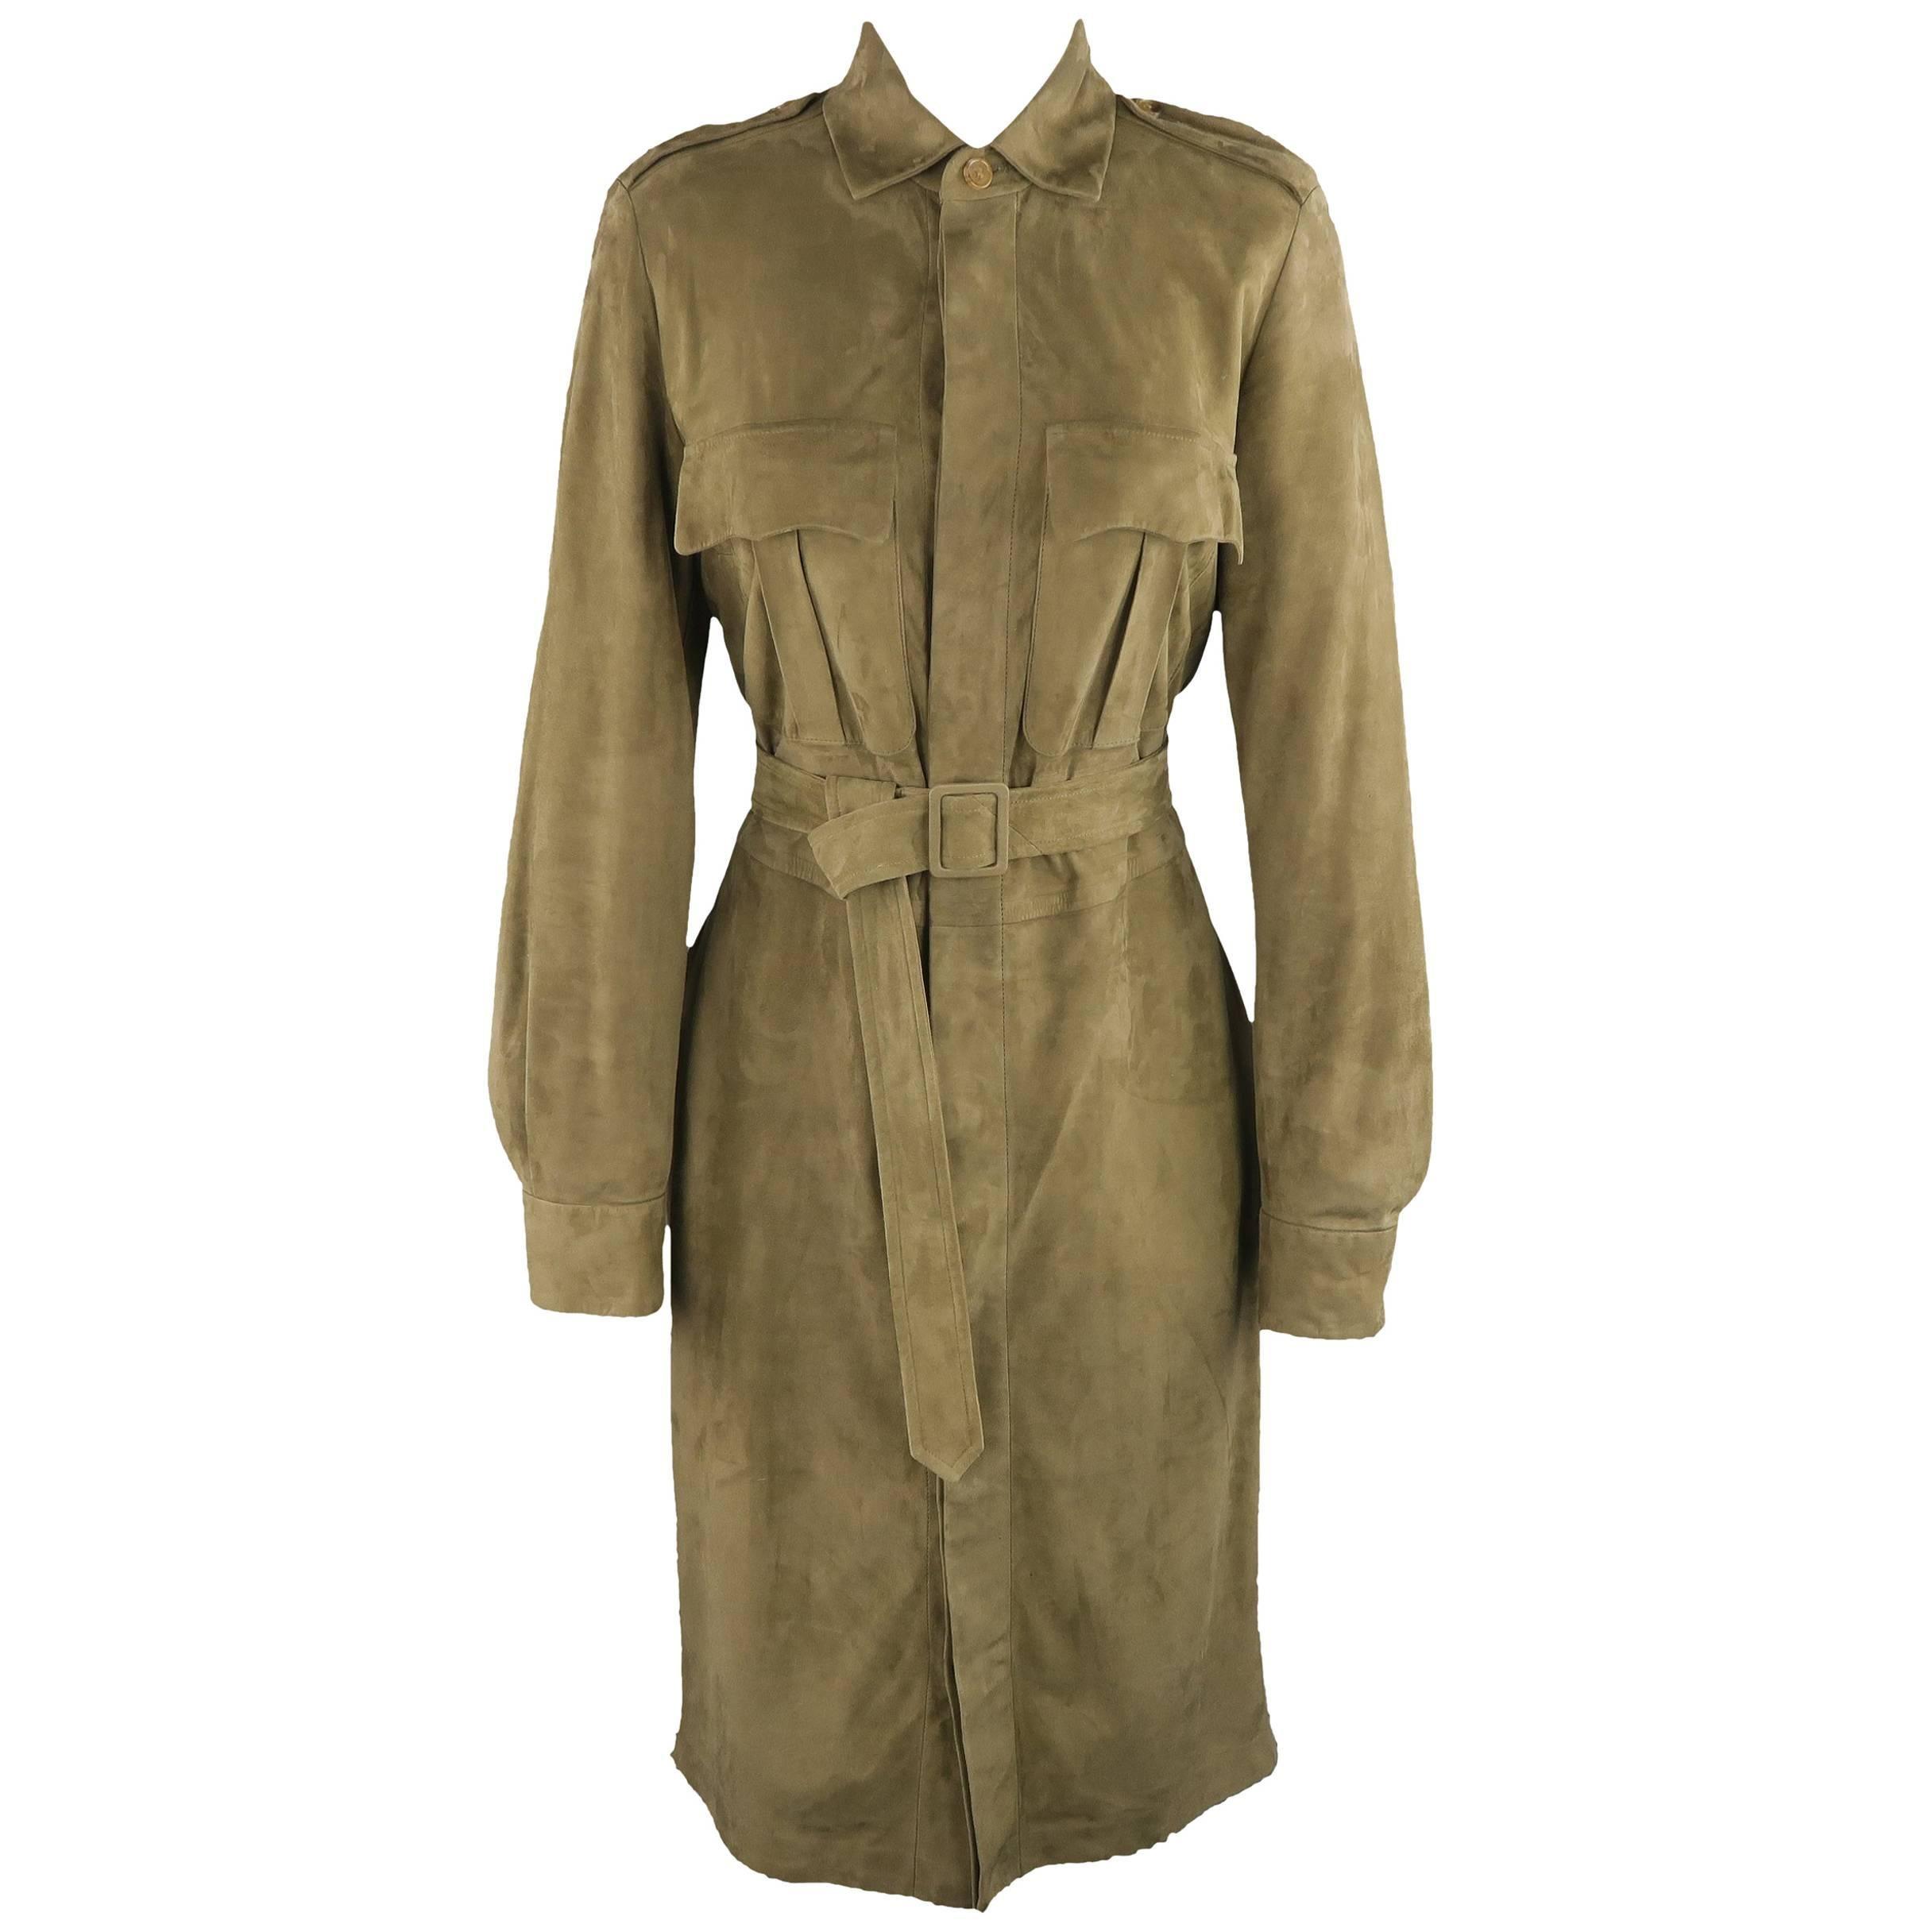 Ralph Lauren Olive Green Suede Safari Dress For Sale